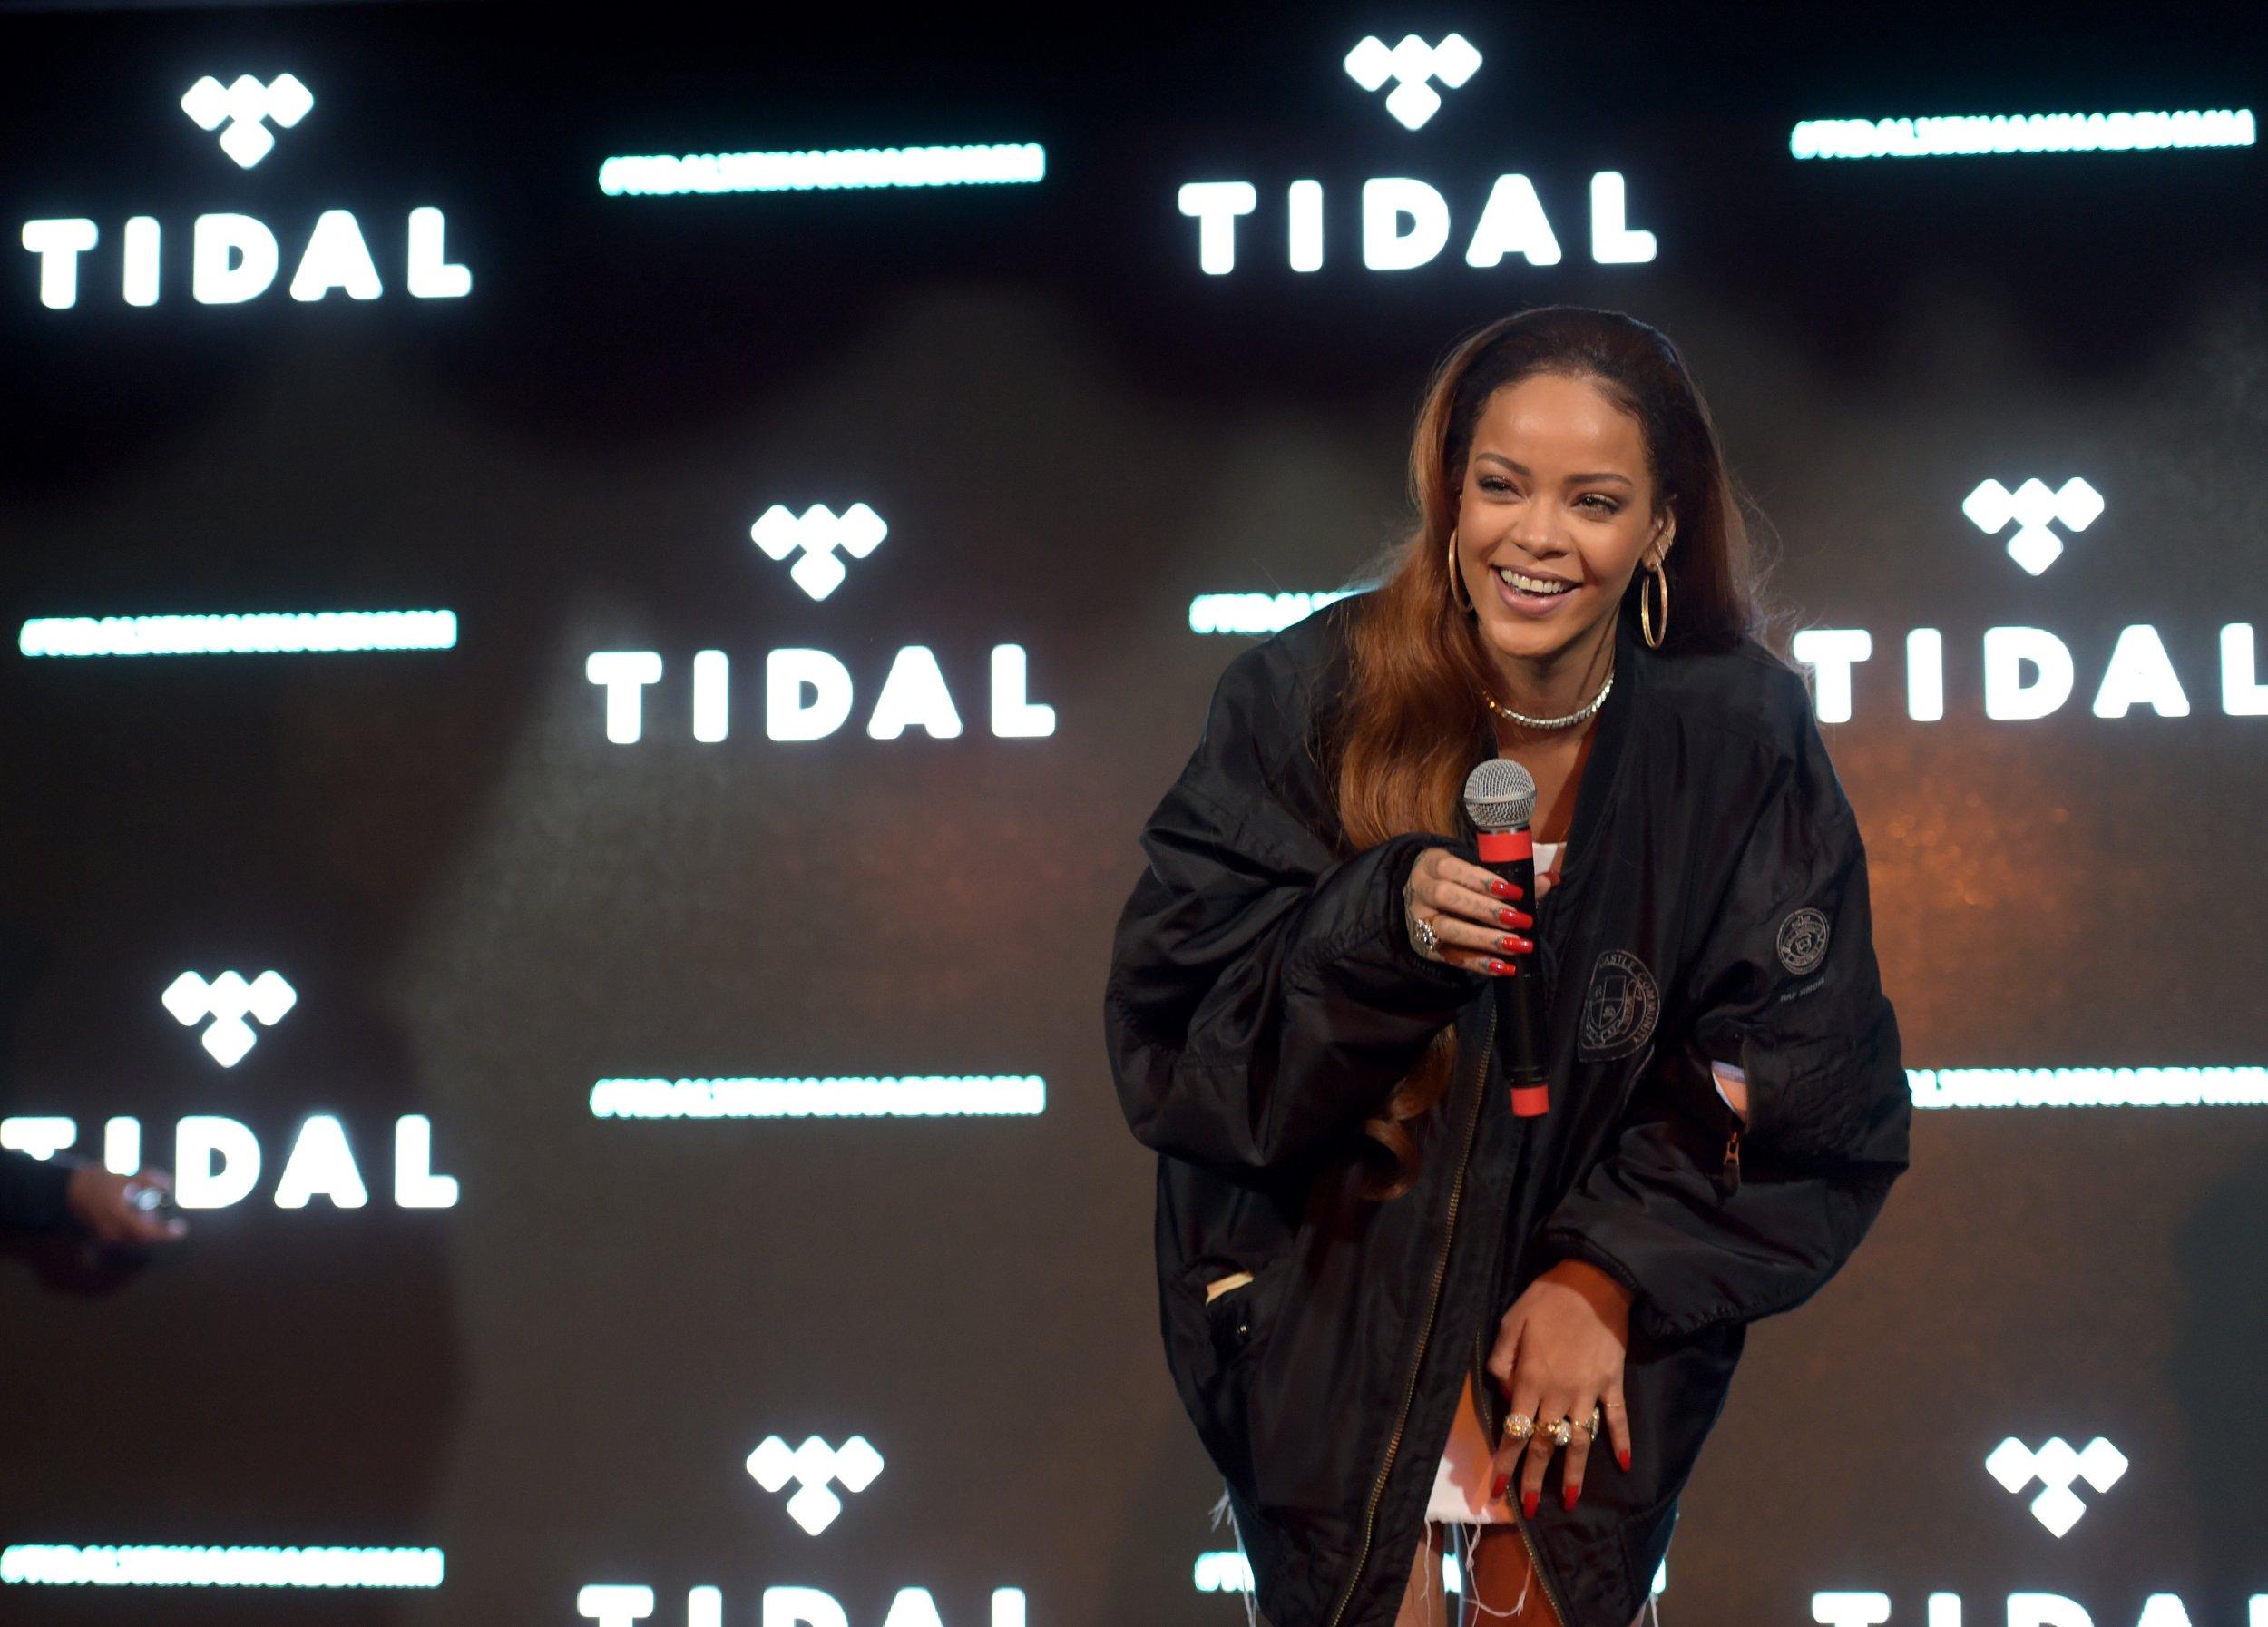 Rihanna at Tidal event